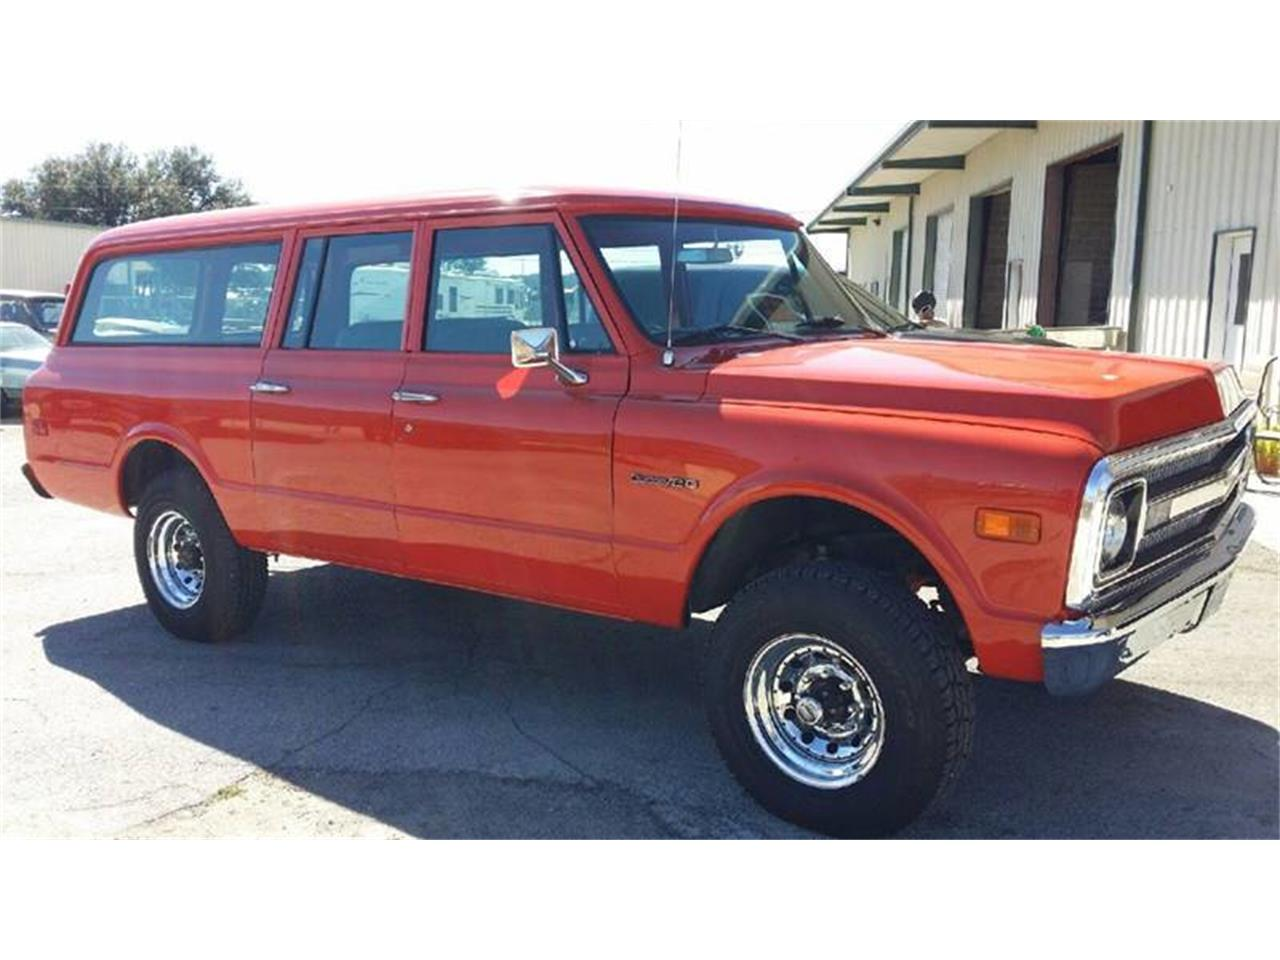 1970 Chevrolet C/K 20 (CC-1069568) for sale in Boerne, Texas